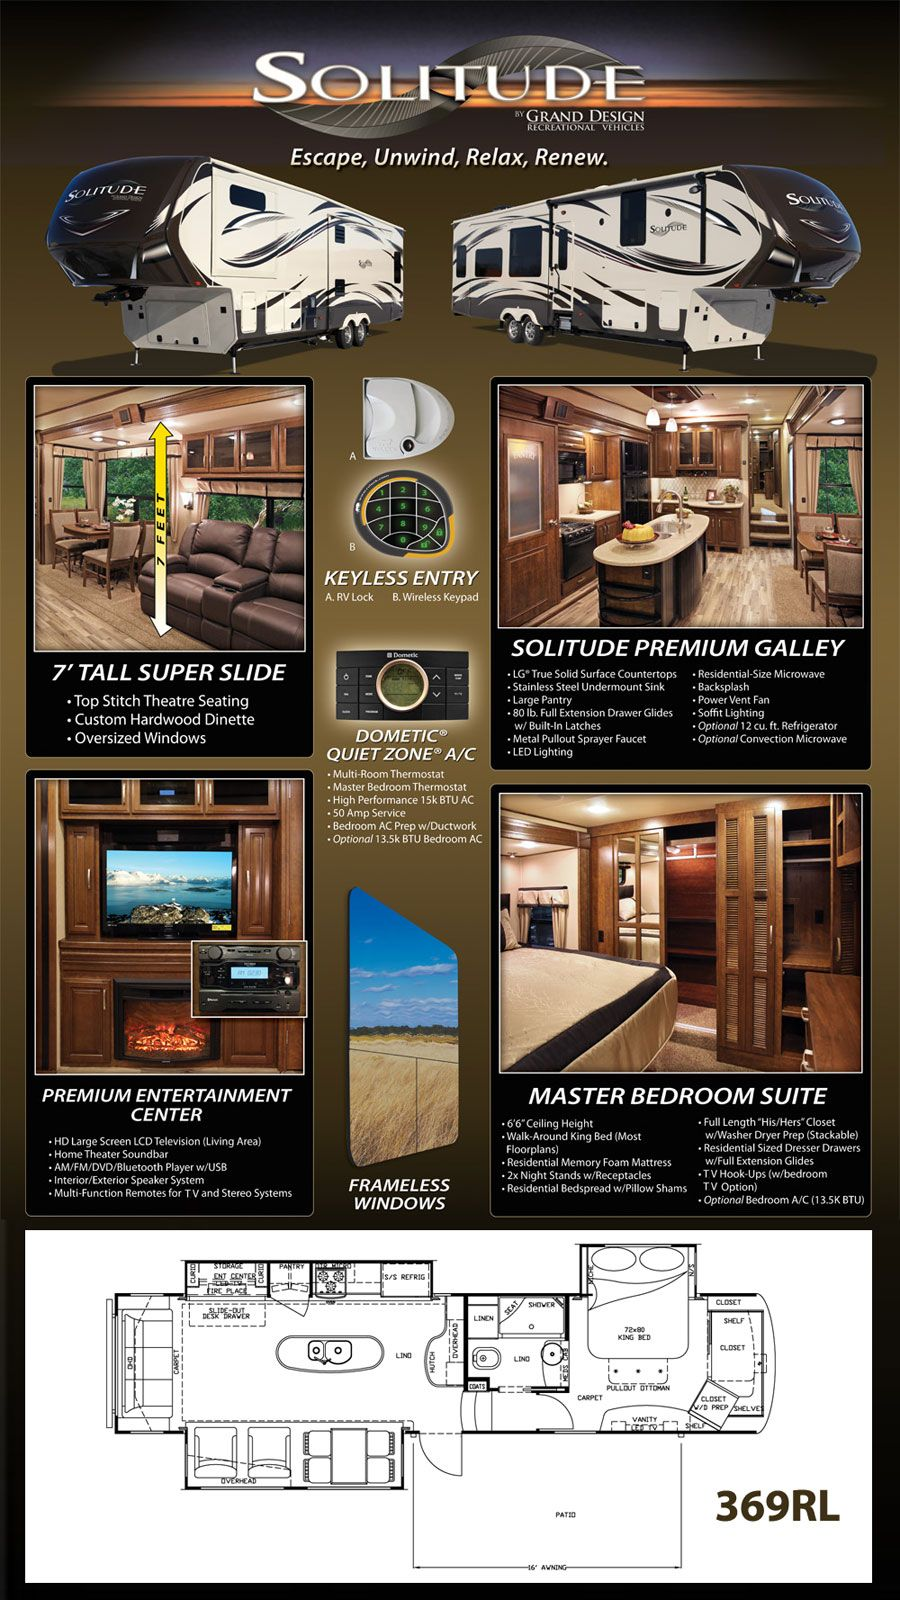 5th wheel master bedroom  Solitude Fifth Wheel by Grand Design RV itus beautiful  New